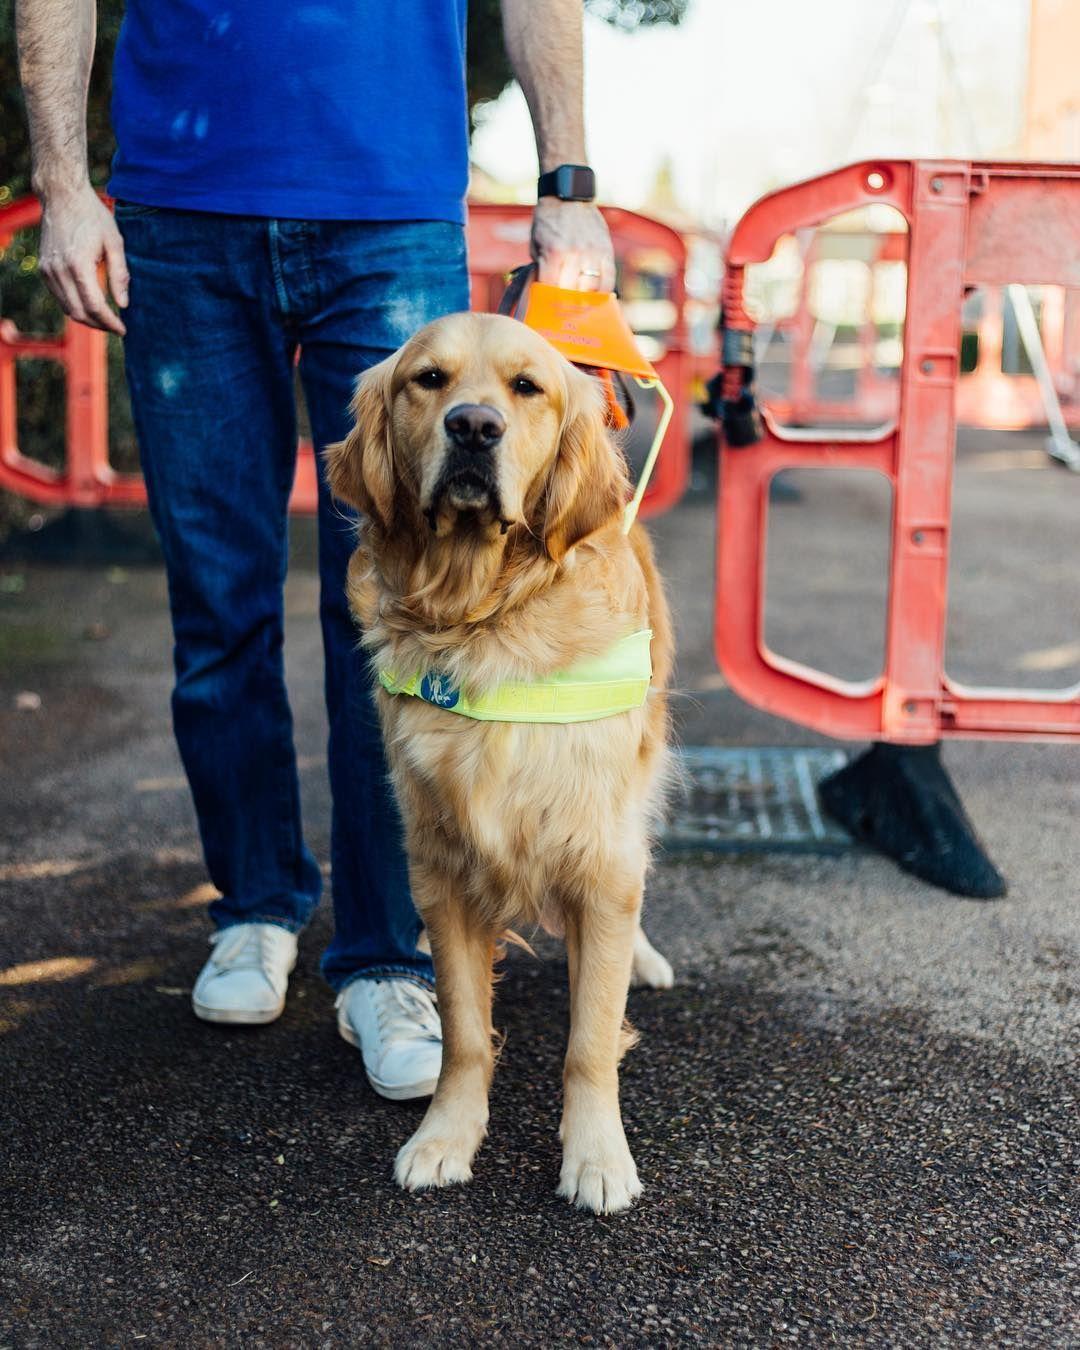 Guide Dogs Uk On Instagram Bobby Golden Retriever Guide Dog In Training Bobby Is A Cal Guide Dog Golden Retriever Puppy